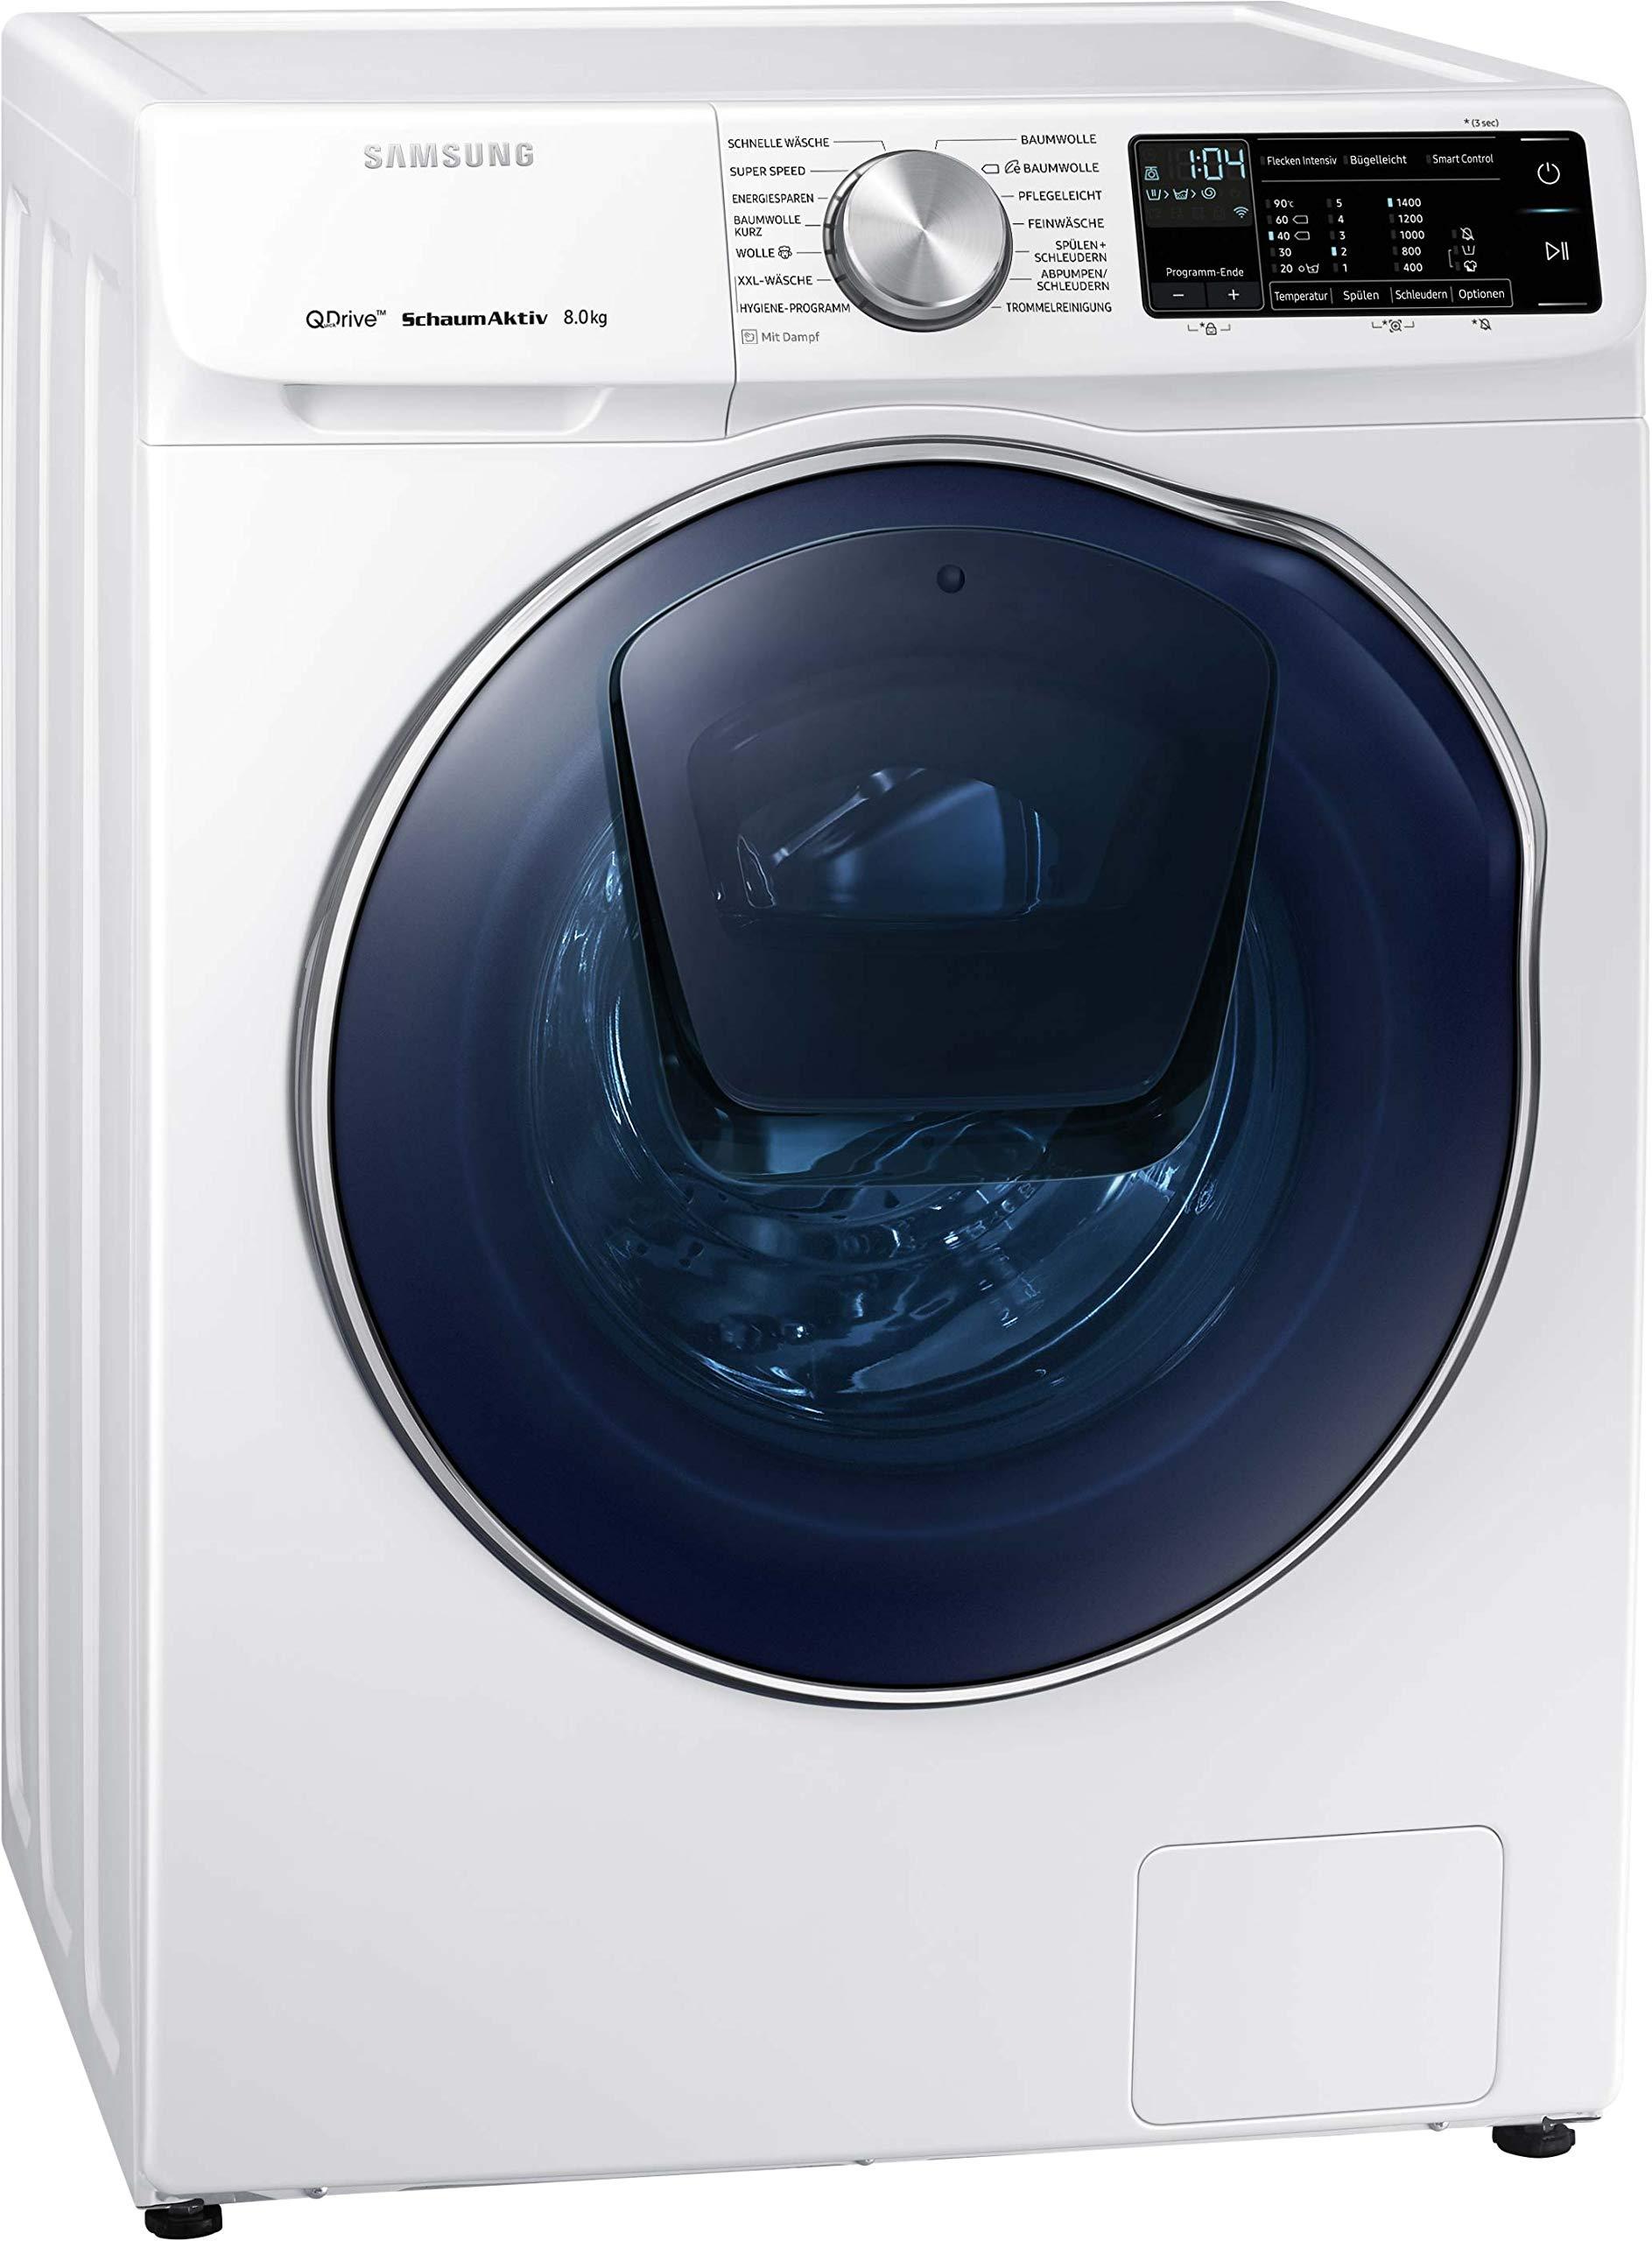 Samsung-WW6900-WW8GM642O2WEG-Waschmaschine-8-kg-1400-Umin-A-QuickDrive-Technologie-AddWash-SchaumAktiv-Technologie-WiFi-Steuerung